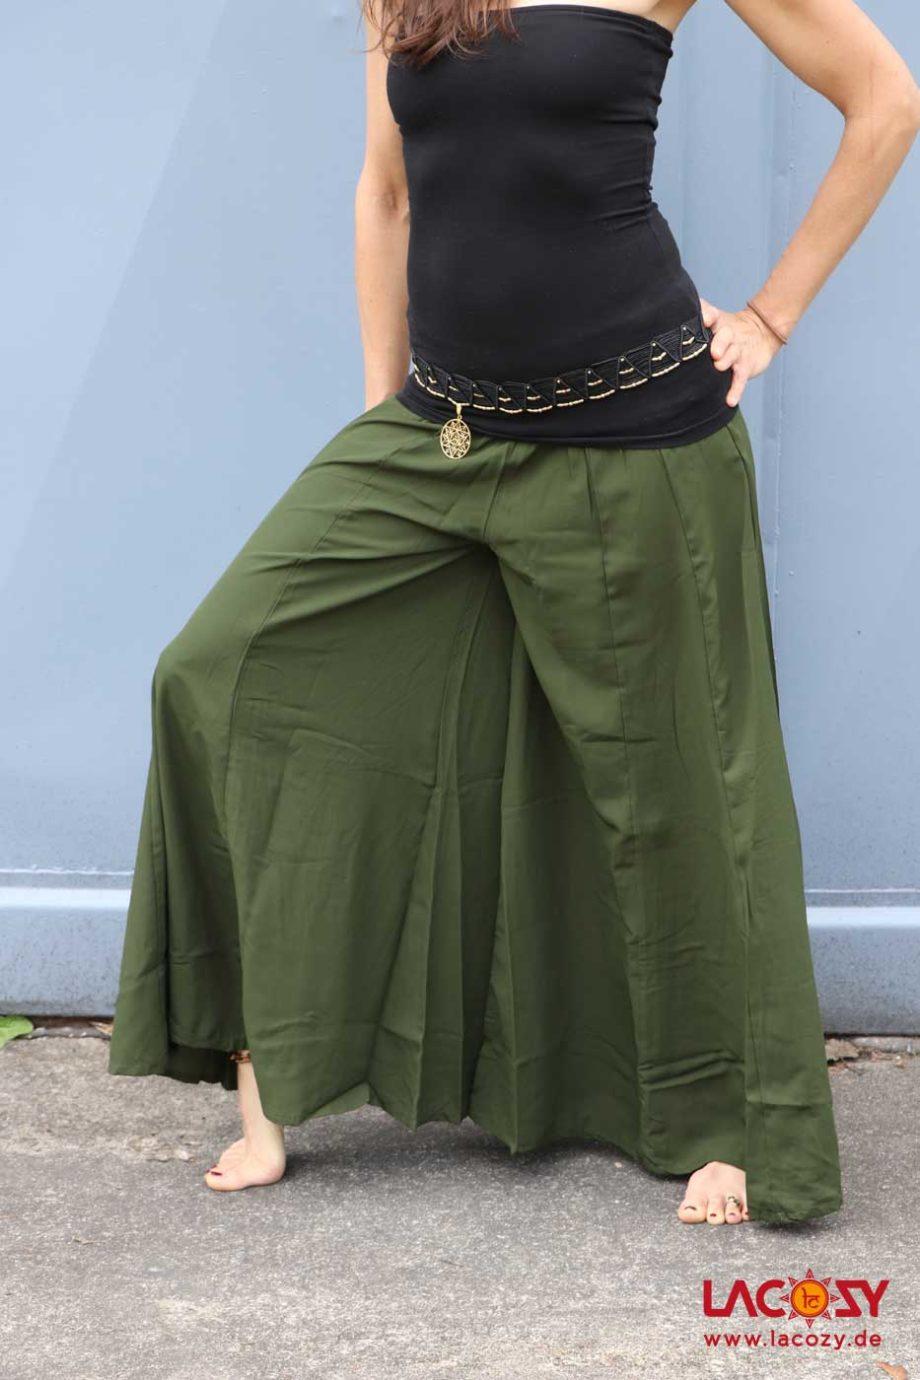 Luftig leichter Hosenrock HEAVON Damen KHAKI